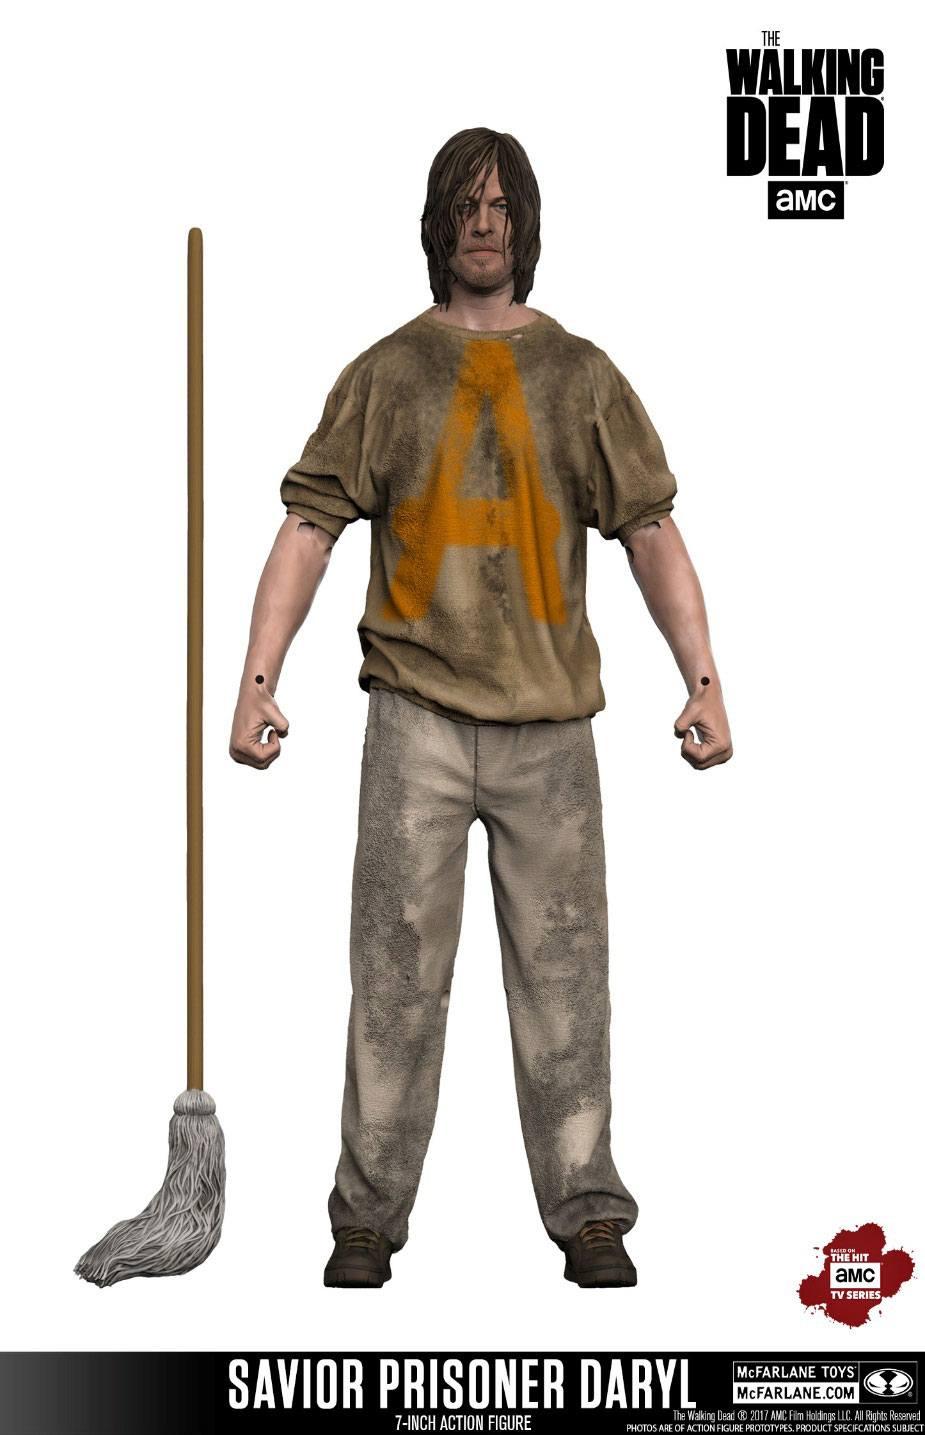 The Walking Dead TV Version Action Figure Savior Prisoner Daryl 18 cm